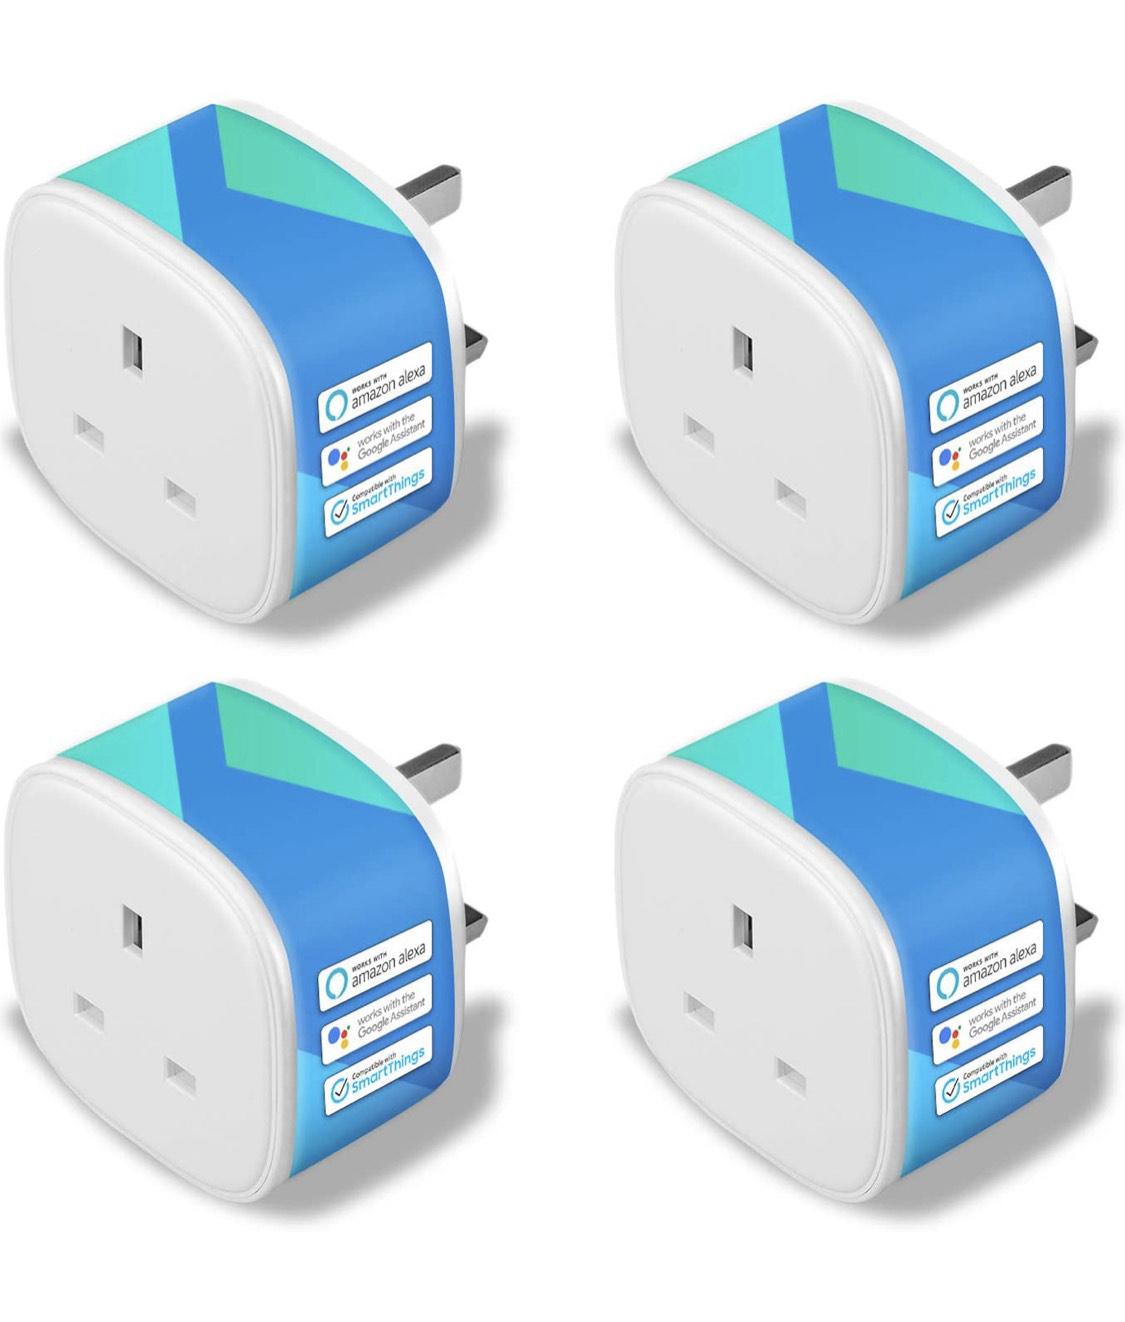 Smart Plug WiFi sockets [New Model] Wireless Socket Remote Control Timer Plug Switch 13A (4PACK) like new £29.91 Amazon warehouse